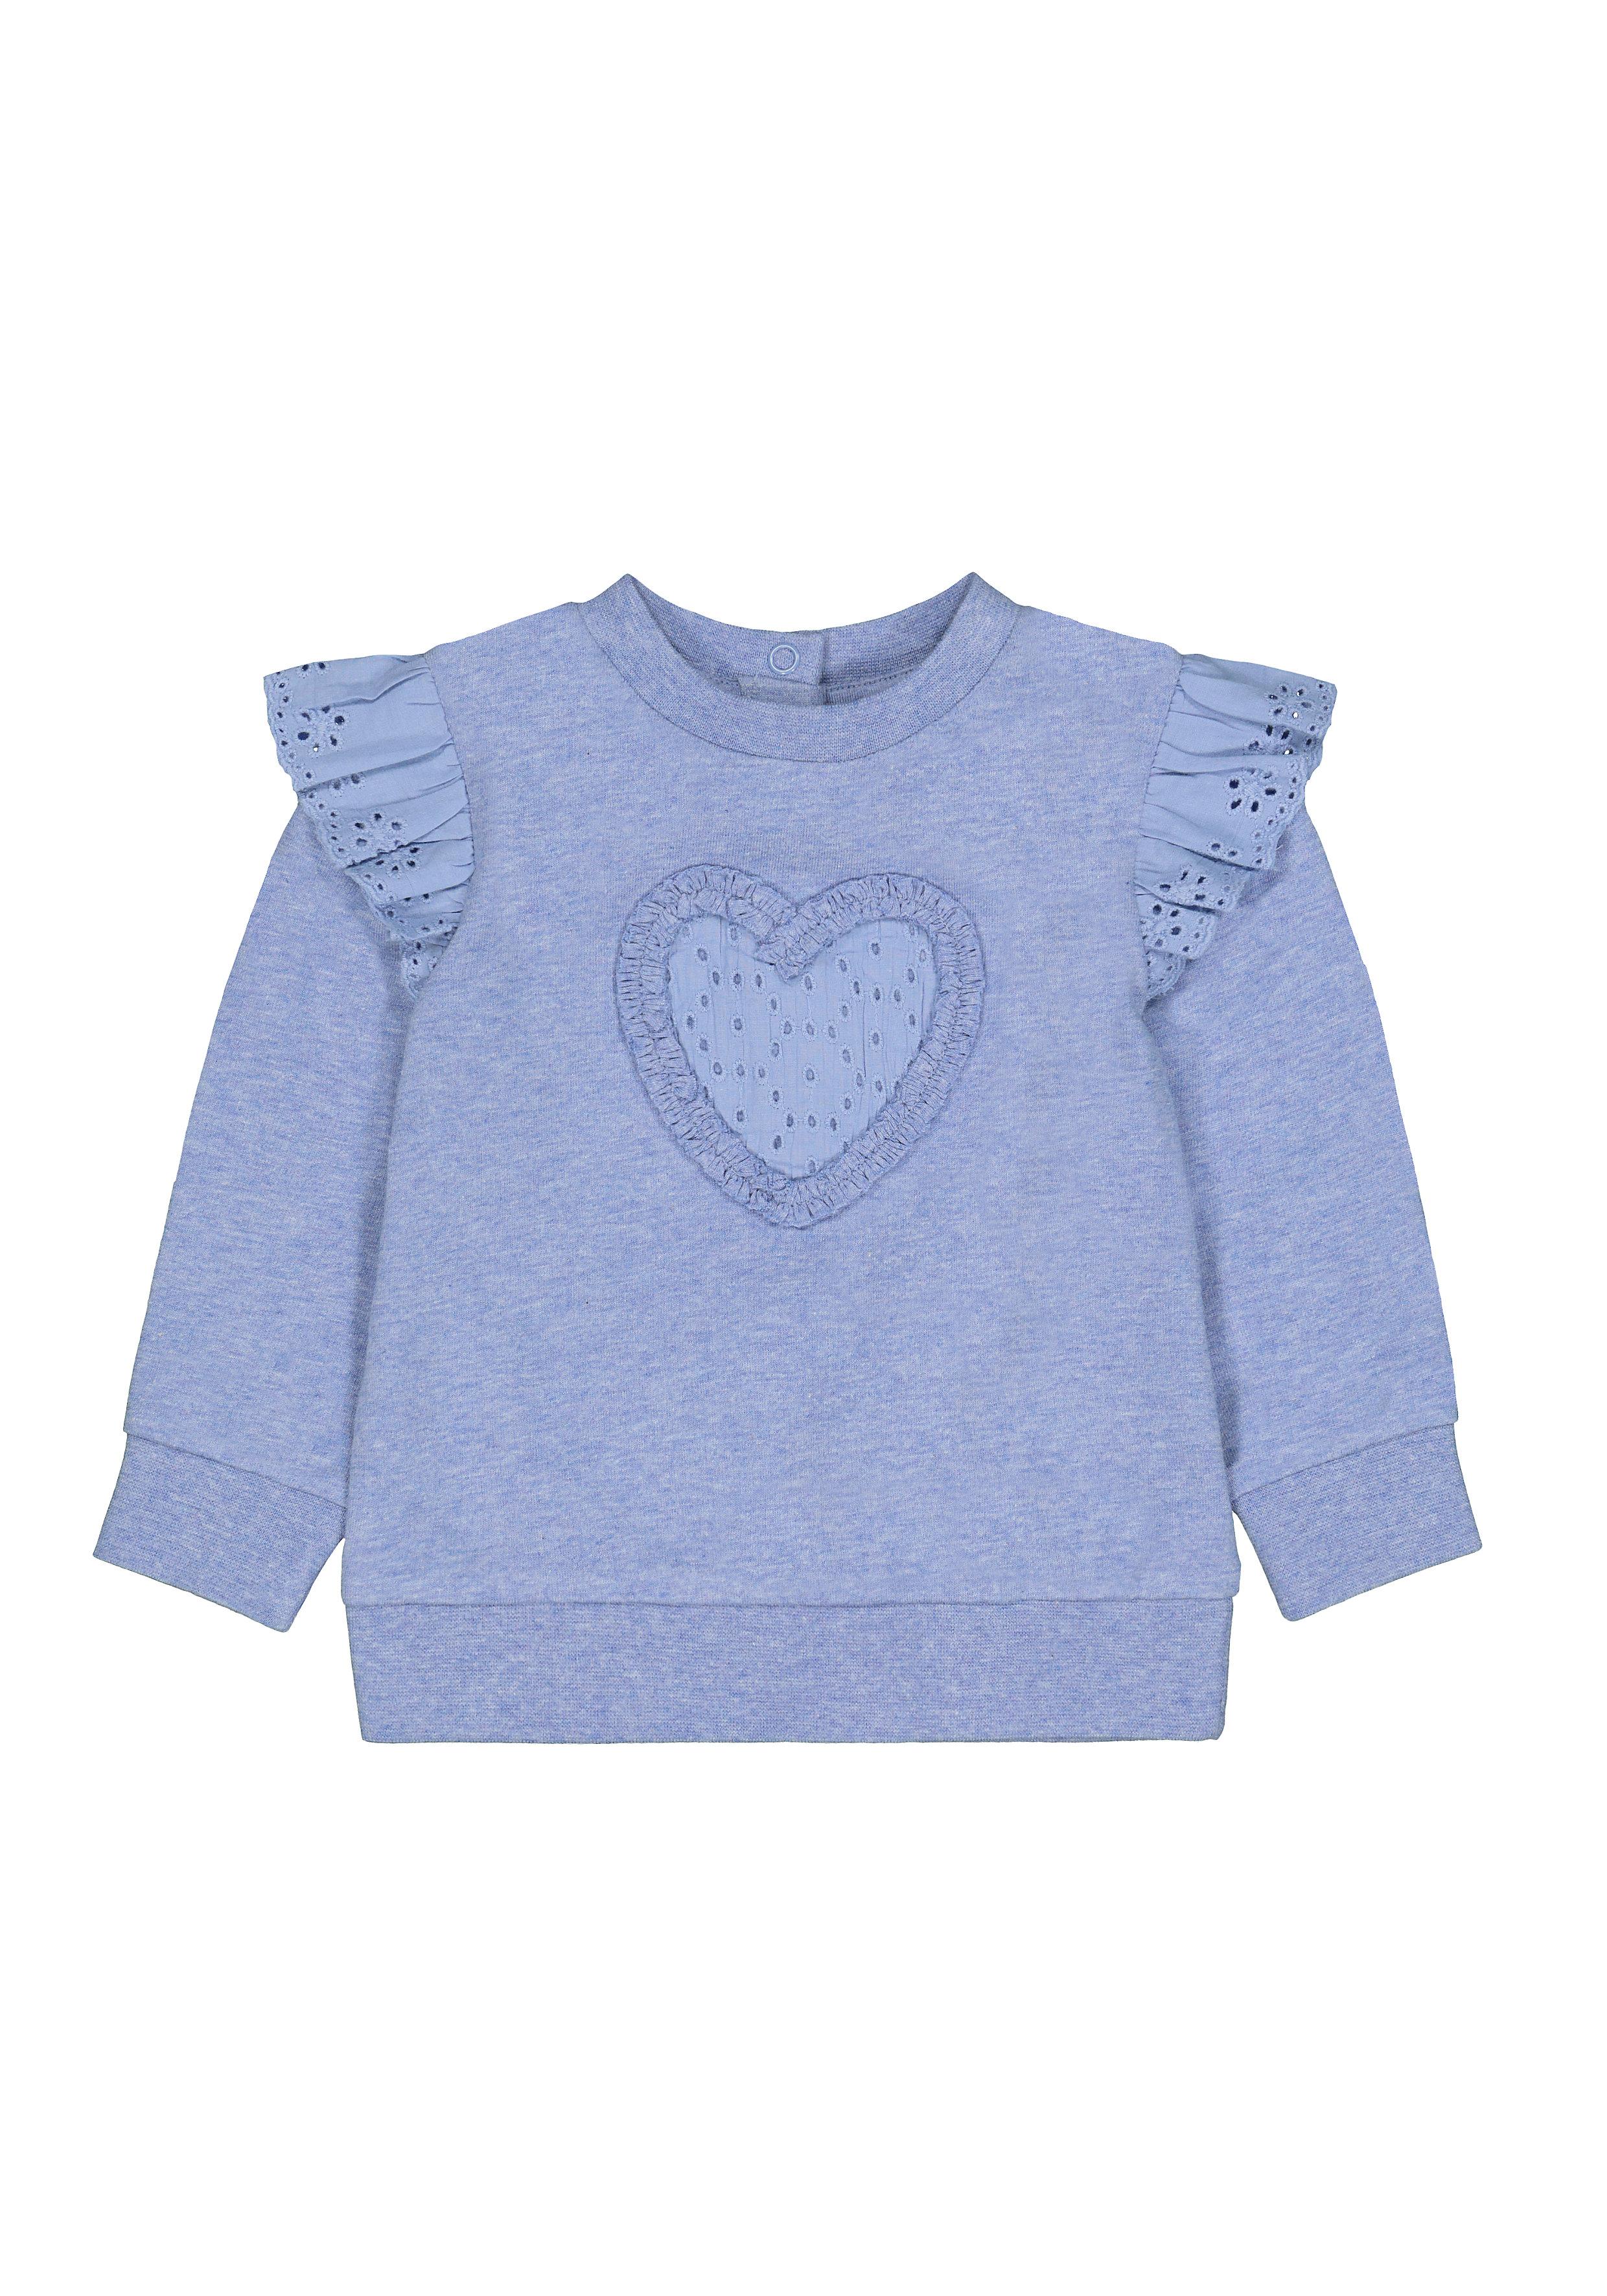 Mothercare | Girls Full Sleeves Sweatshirt Heart Patchwork - Blue